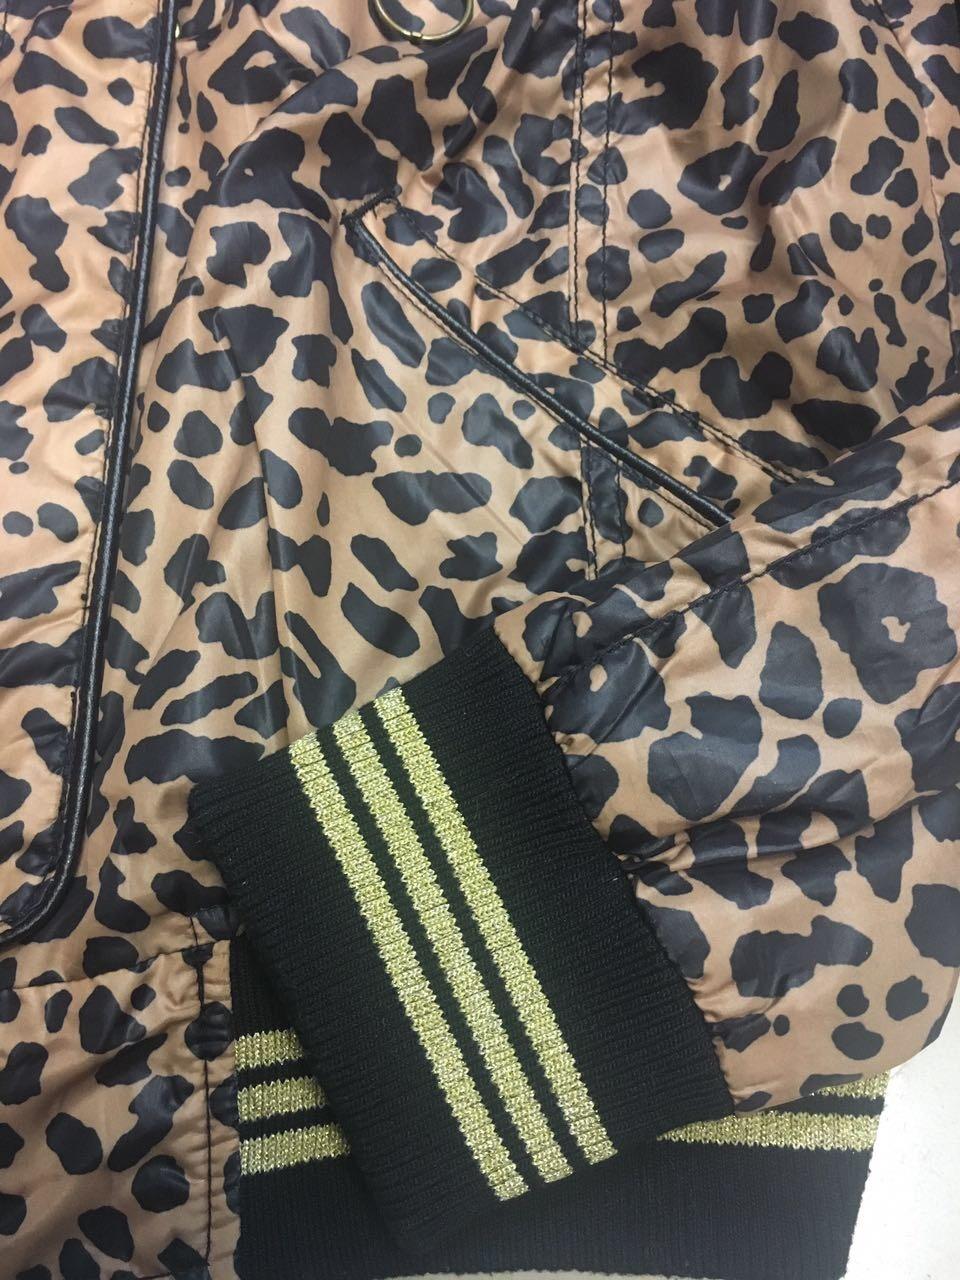 Куртка Galliano, 46-48 размеры